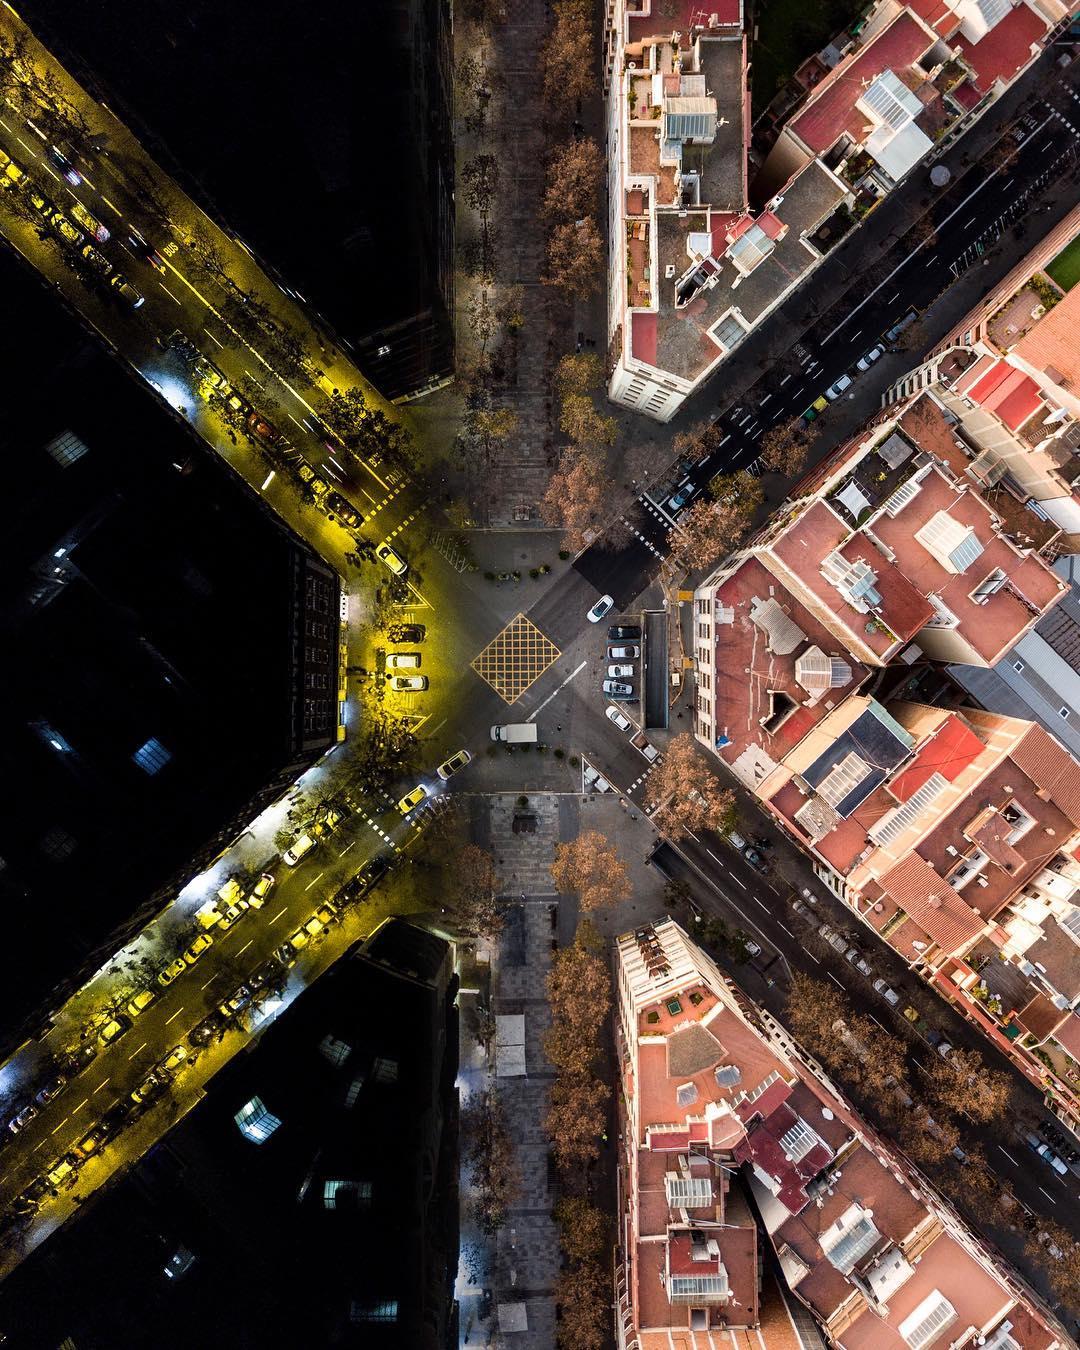 Barcelona aérea drone Marton Mogyorosy loqueva (12)